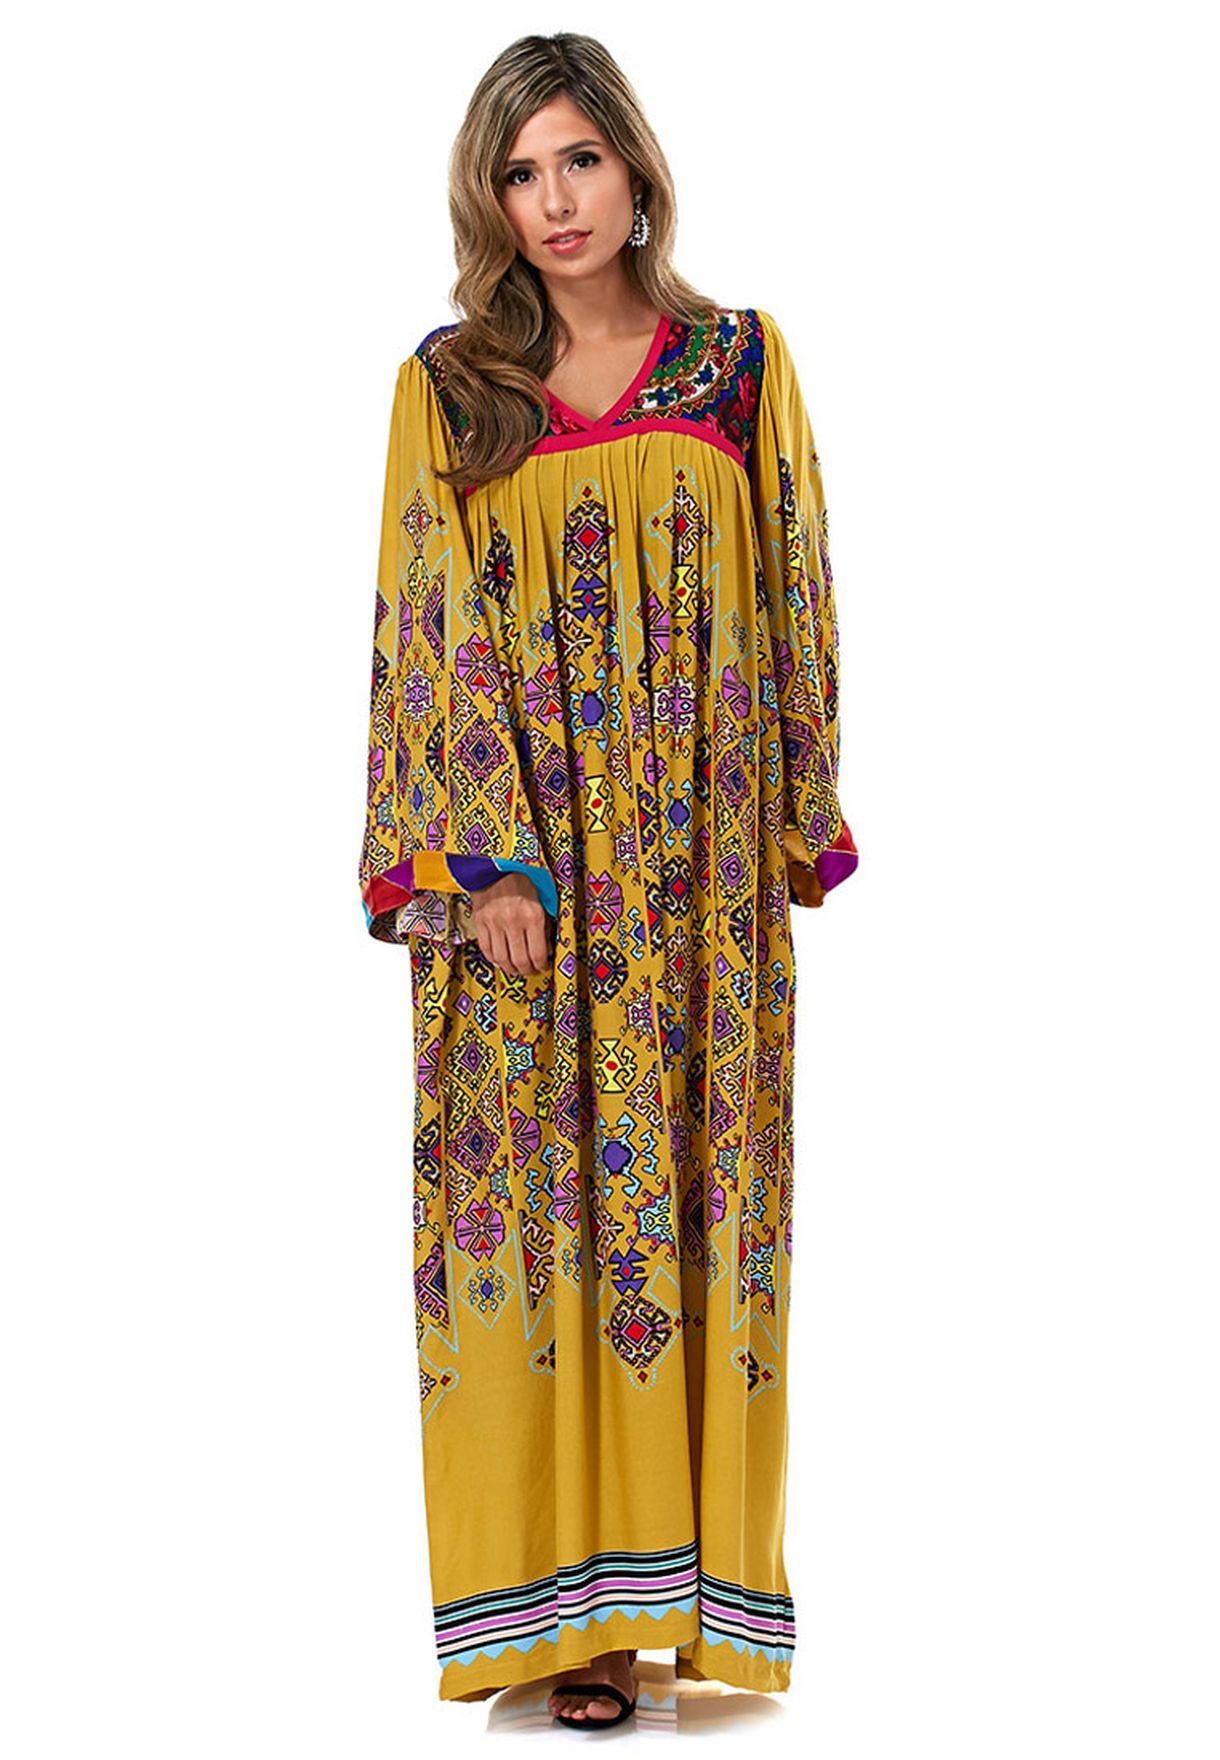 891db5286 Shop Anaya yellow Printed Kaftan for Women in Oman - AN332AT90BXH